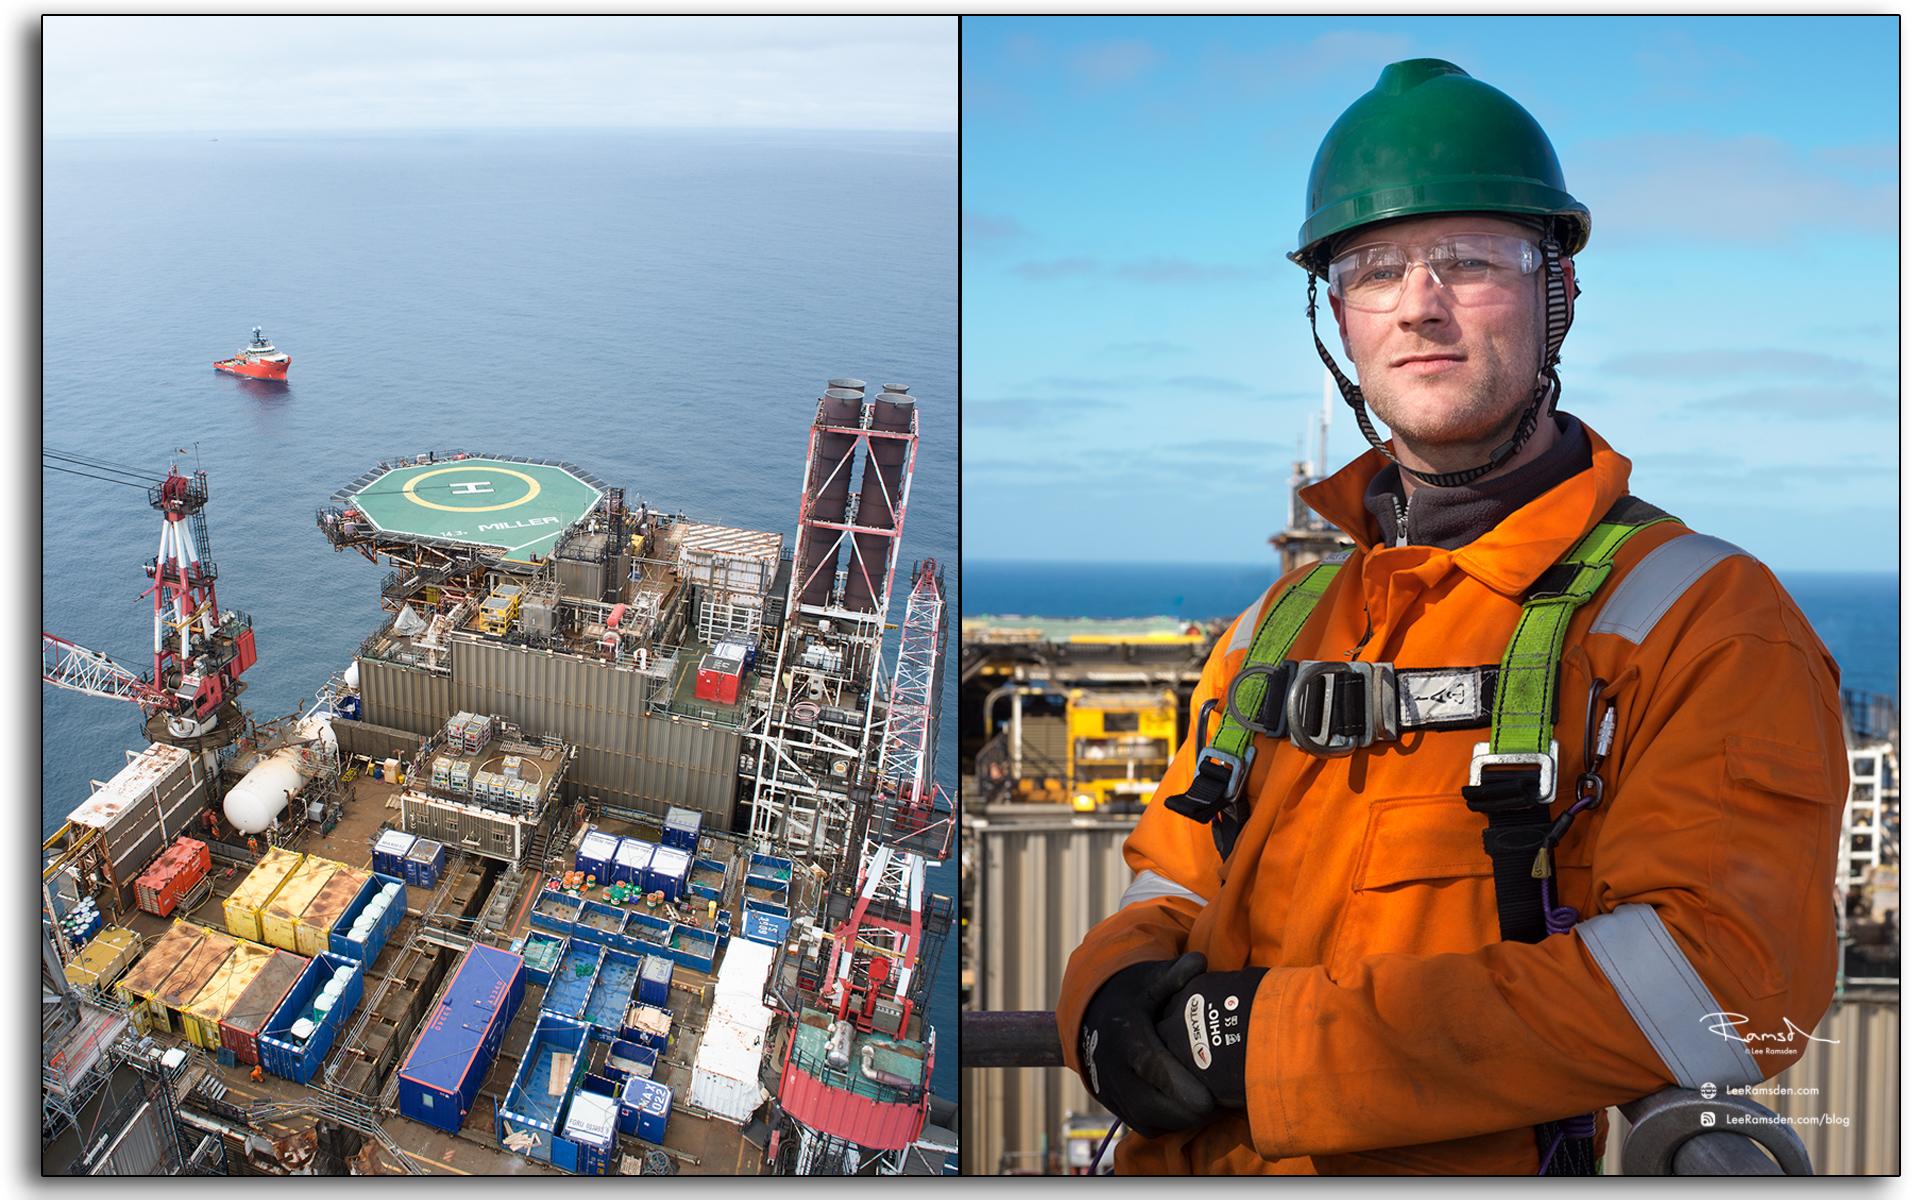 blog, Scaffodler, Mark Wilson, Marc Wilson, Brand energy, ACN, oil and gas industry, portrait, portrature, selfie, BP Miller, oil and gas rig, Petrofac, BP